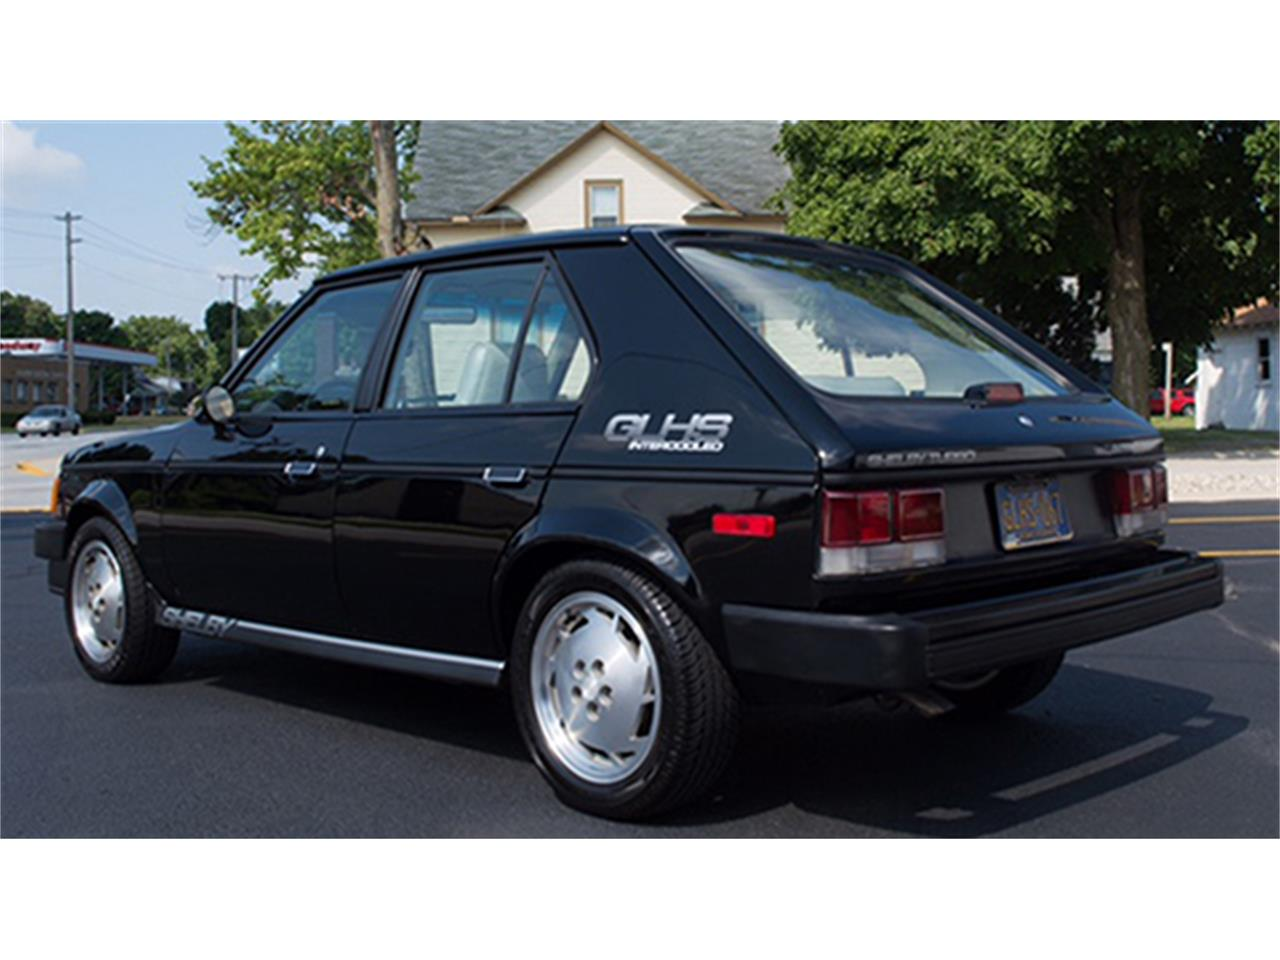 shelby dodge omni glhs  door hatchback  sale classiccarscom cc